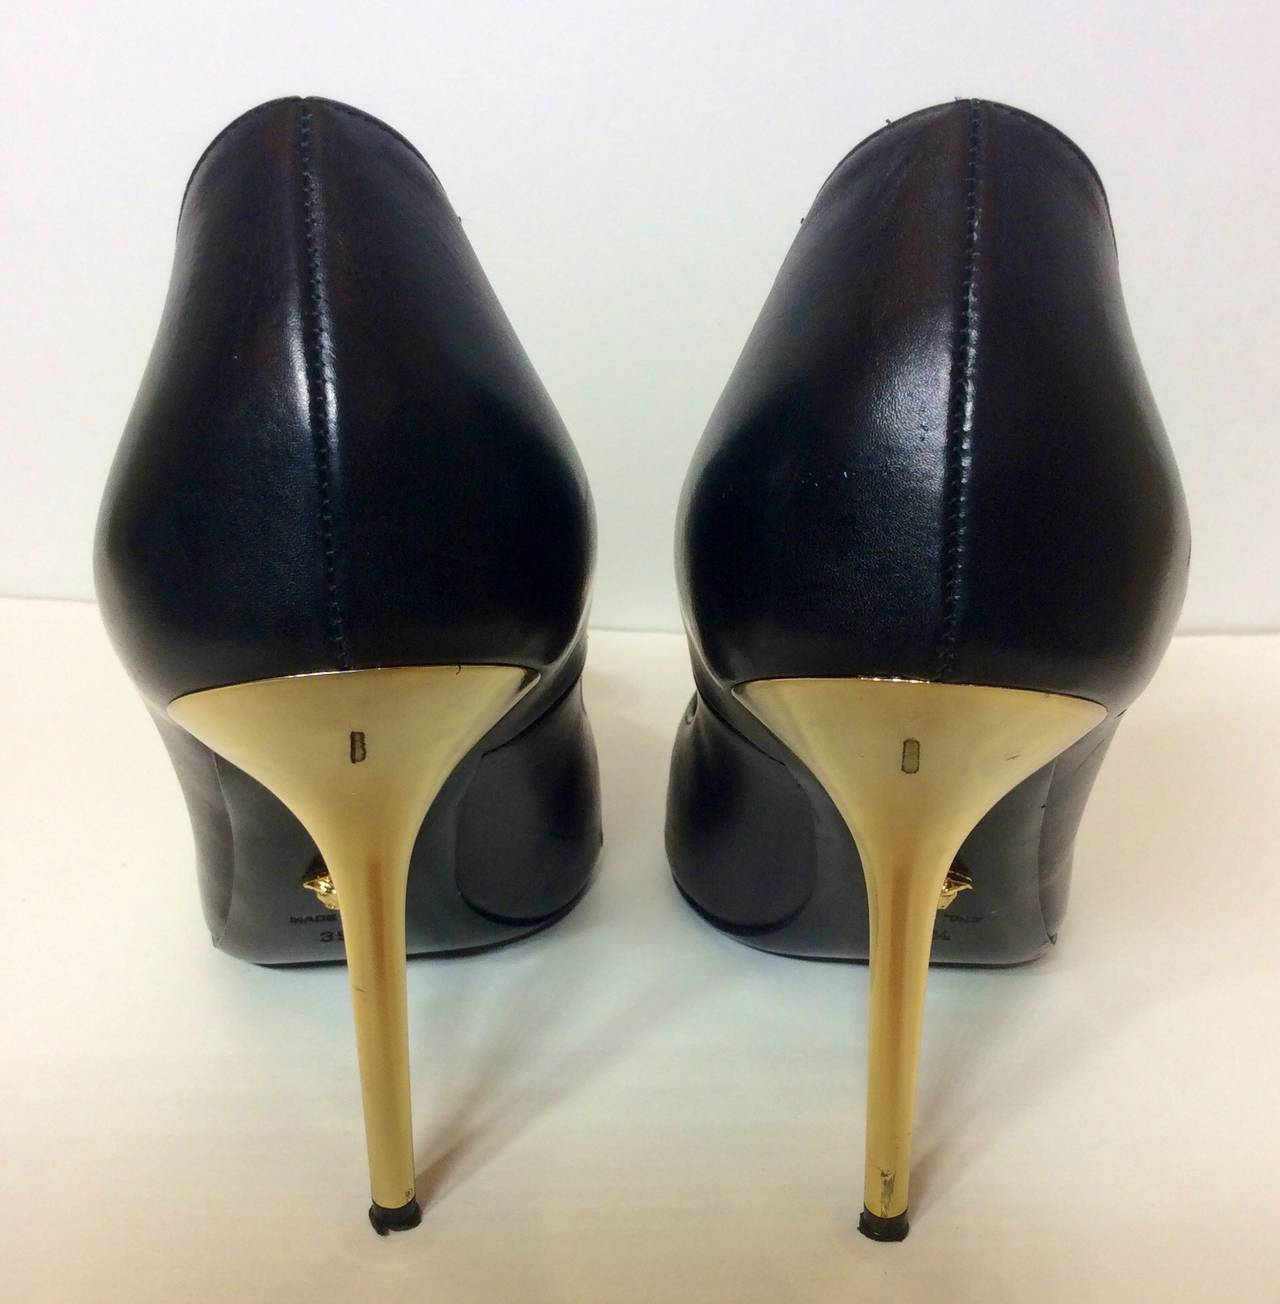 Versace Palazzo Stiletto Gold Medusa High Heels 39 1/2 At